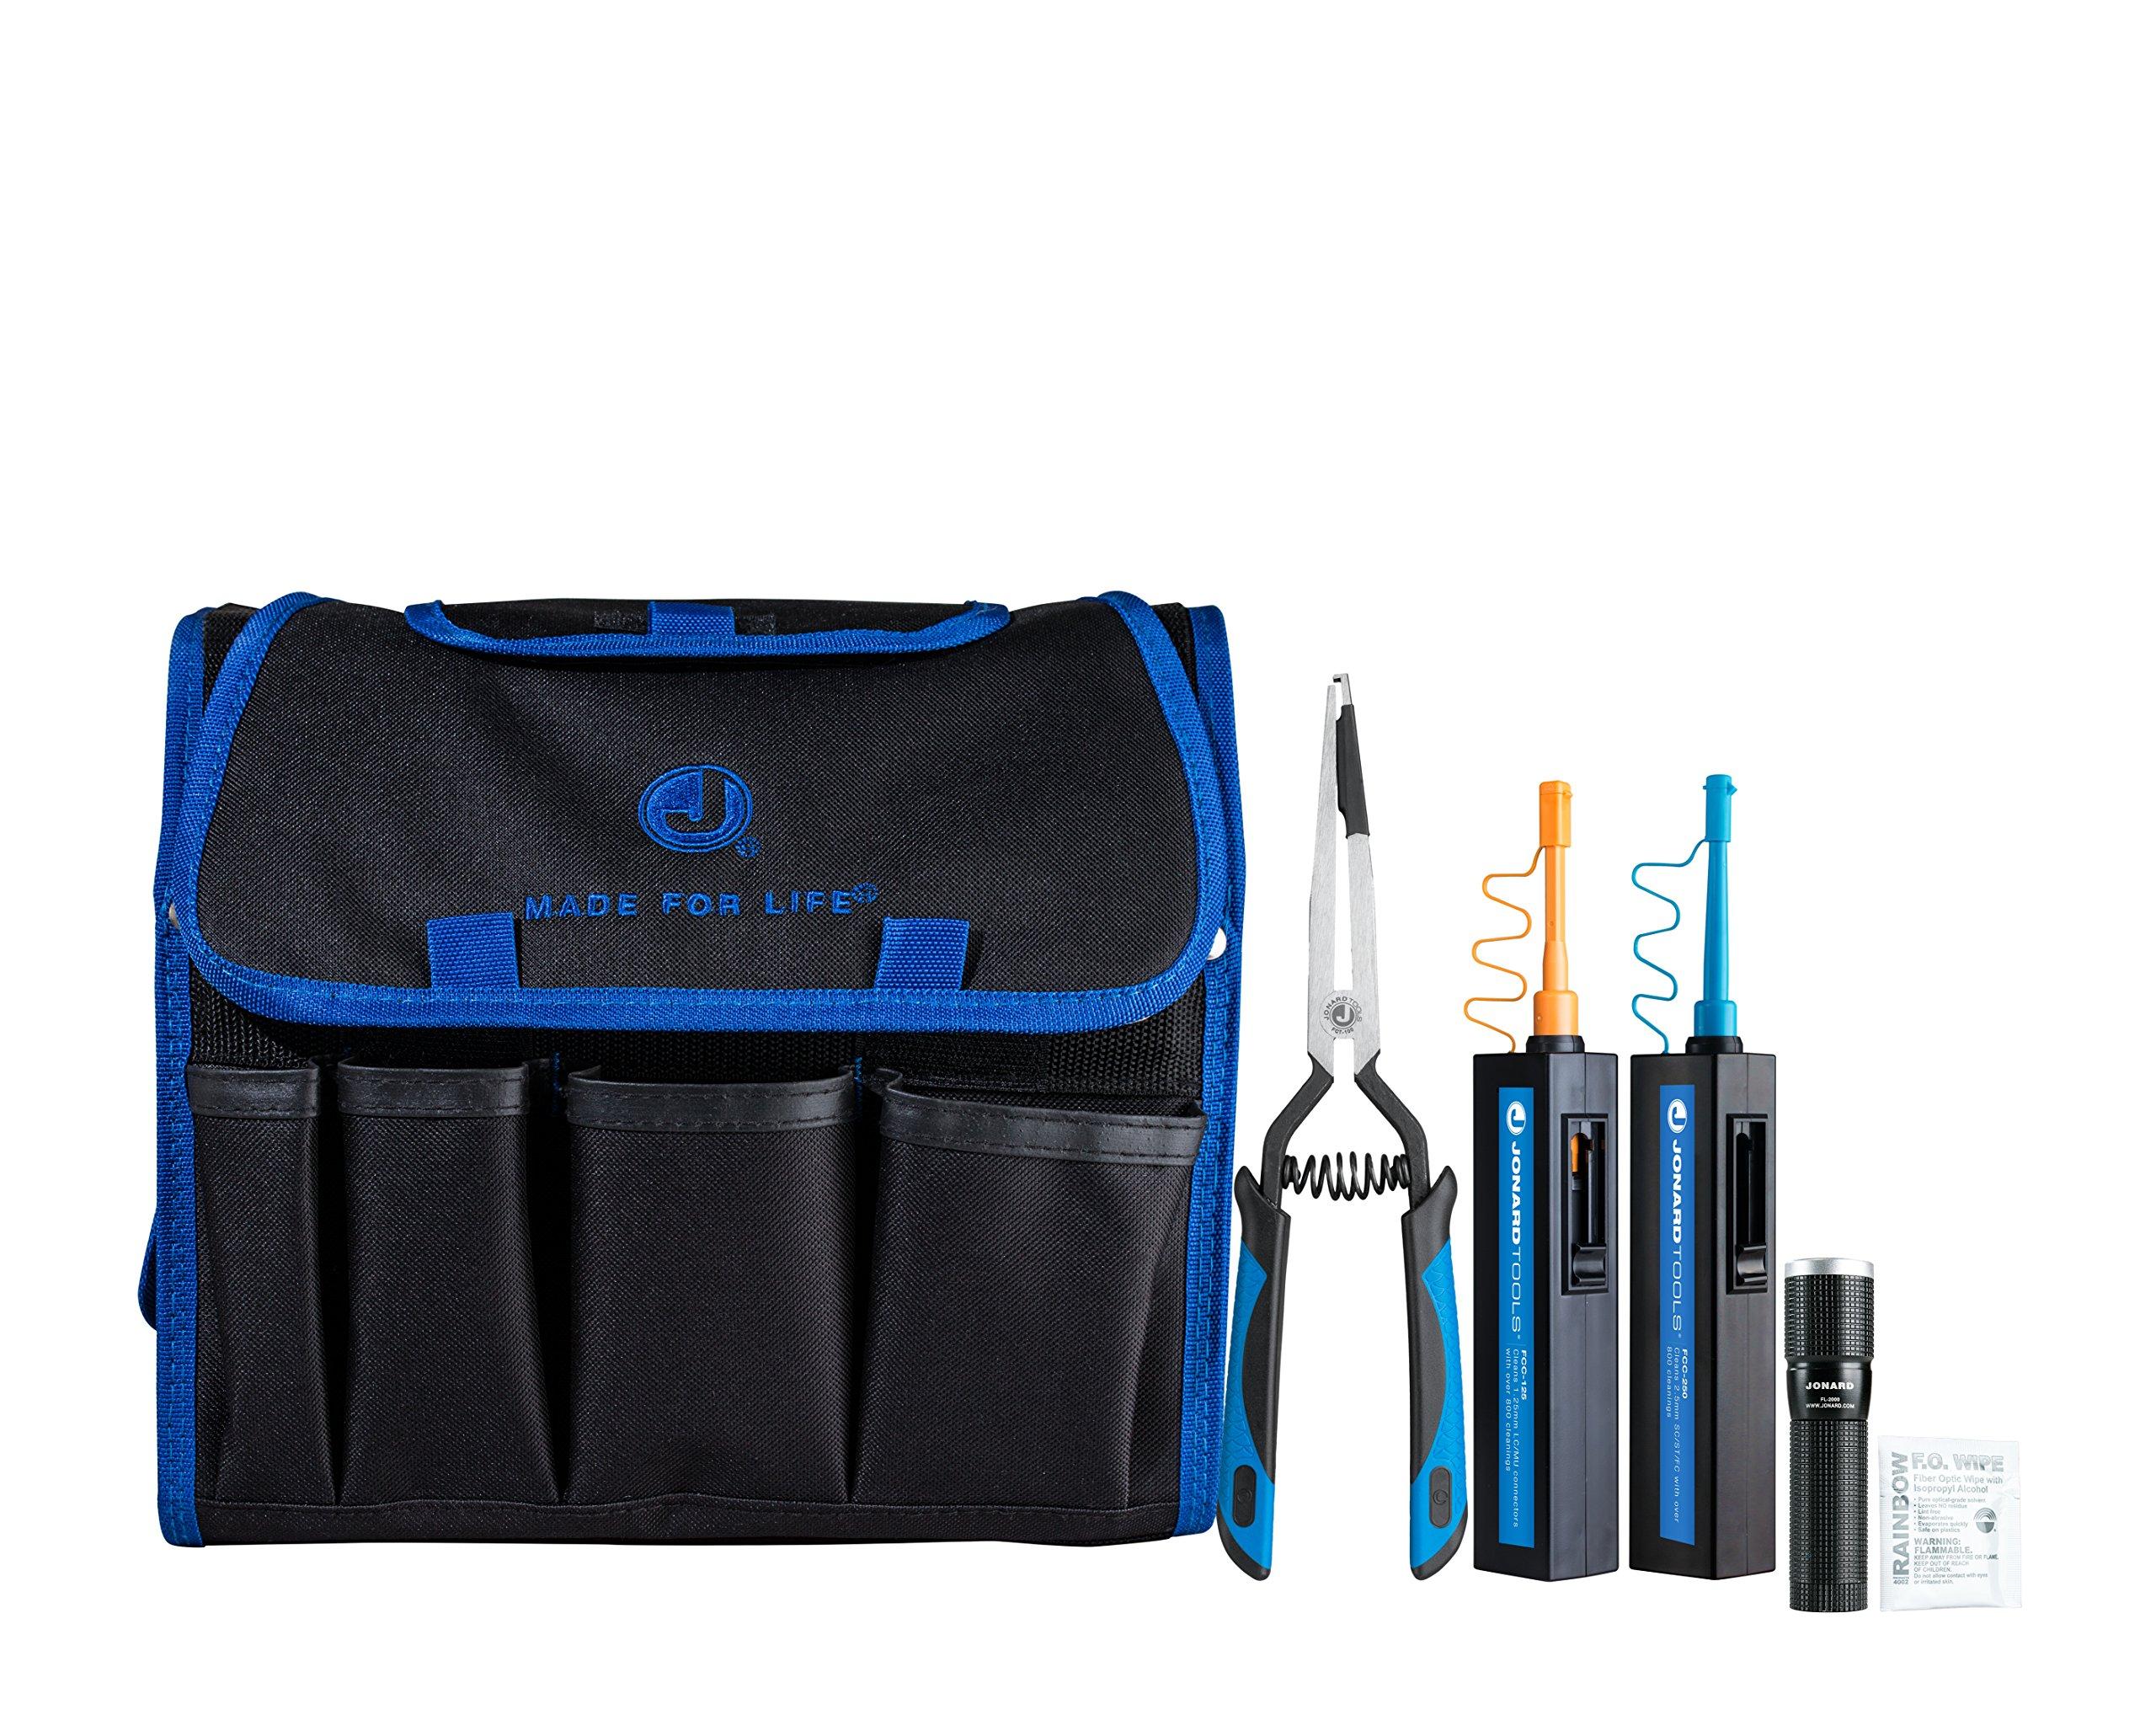 Jonard Tools TK-186 Fiber Optic Connector Cleaning Kit